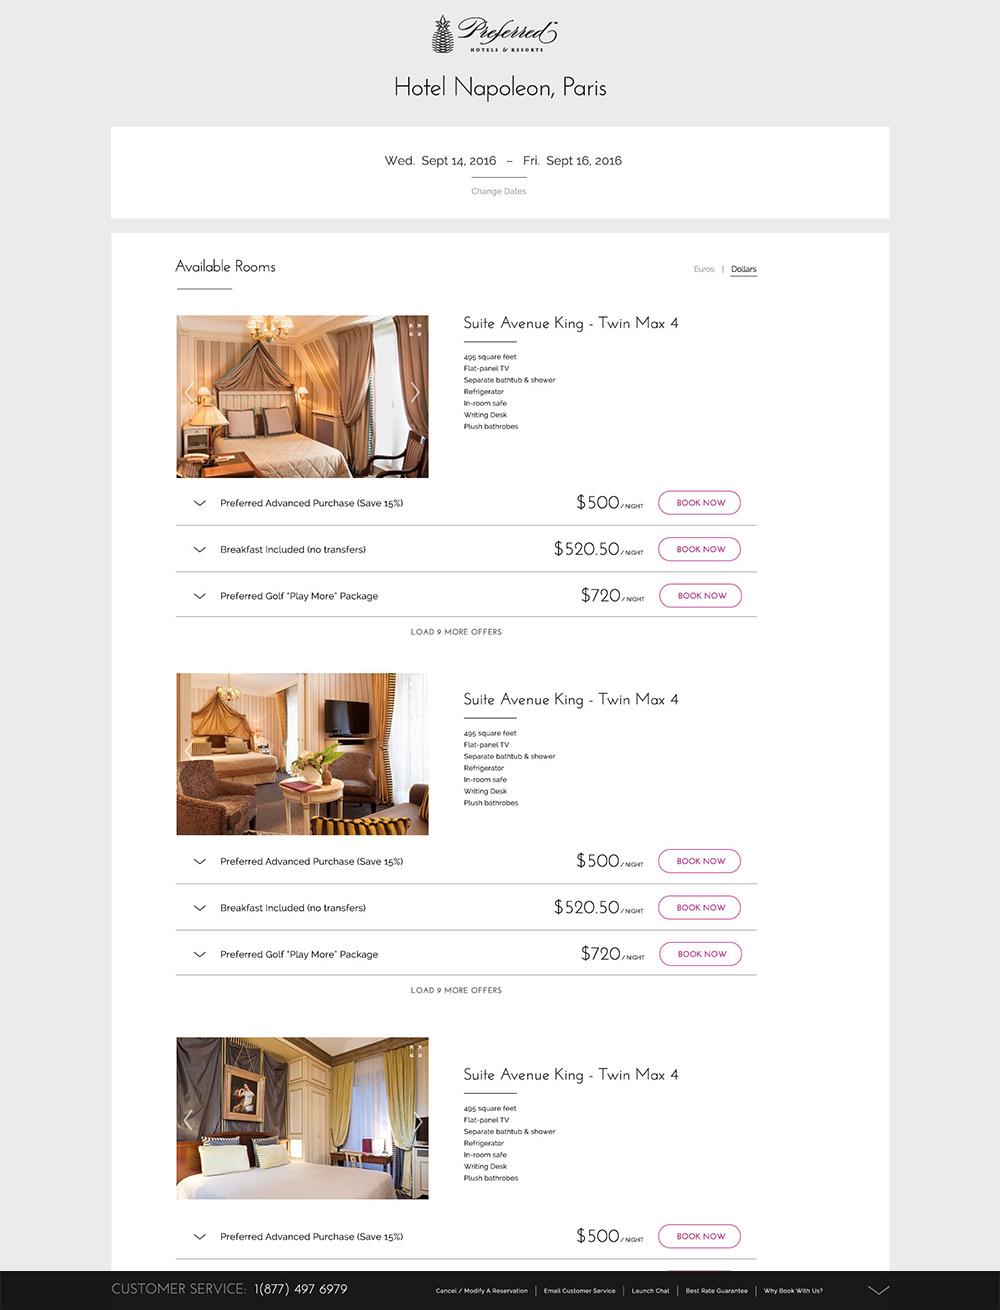 Step 2: Choose Room / Offer (rate code)